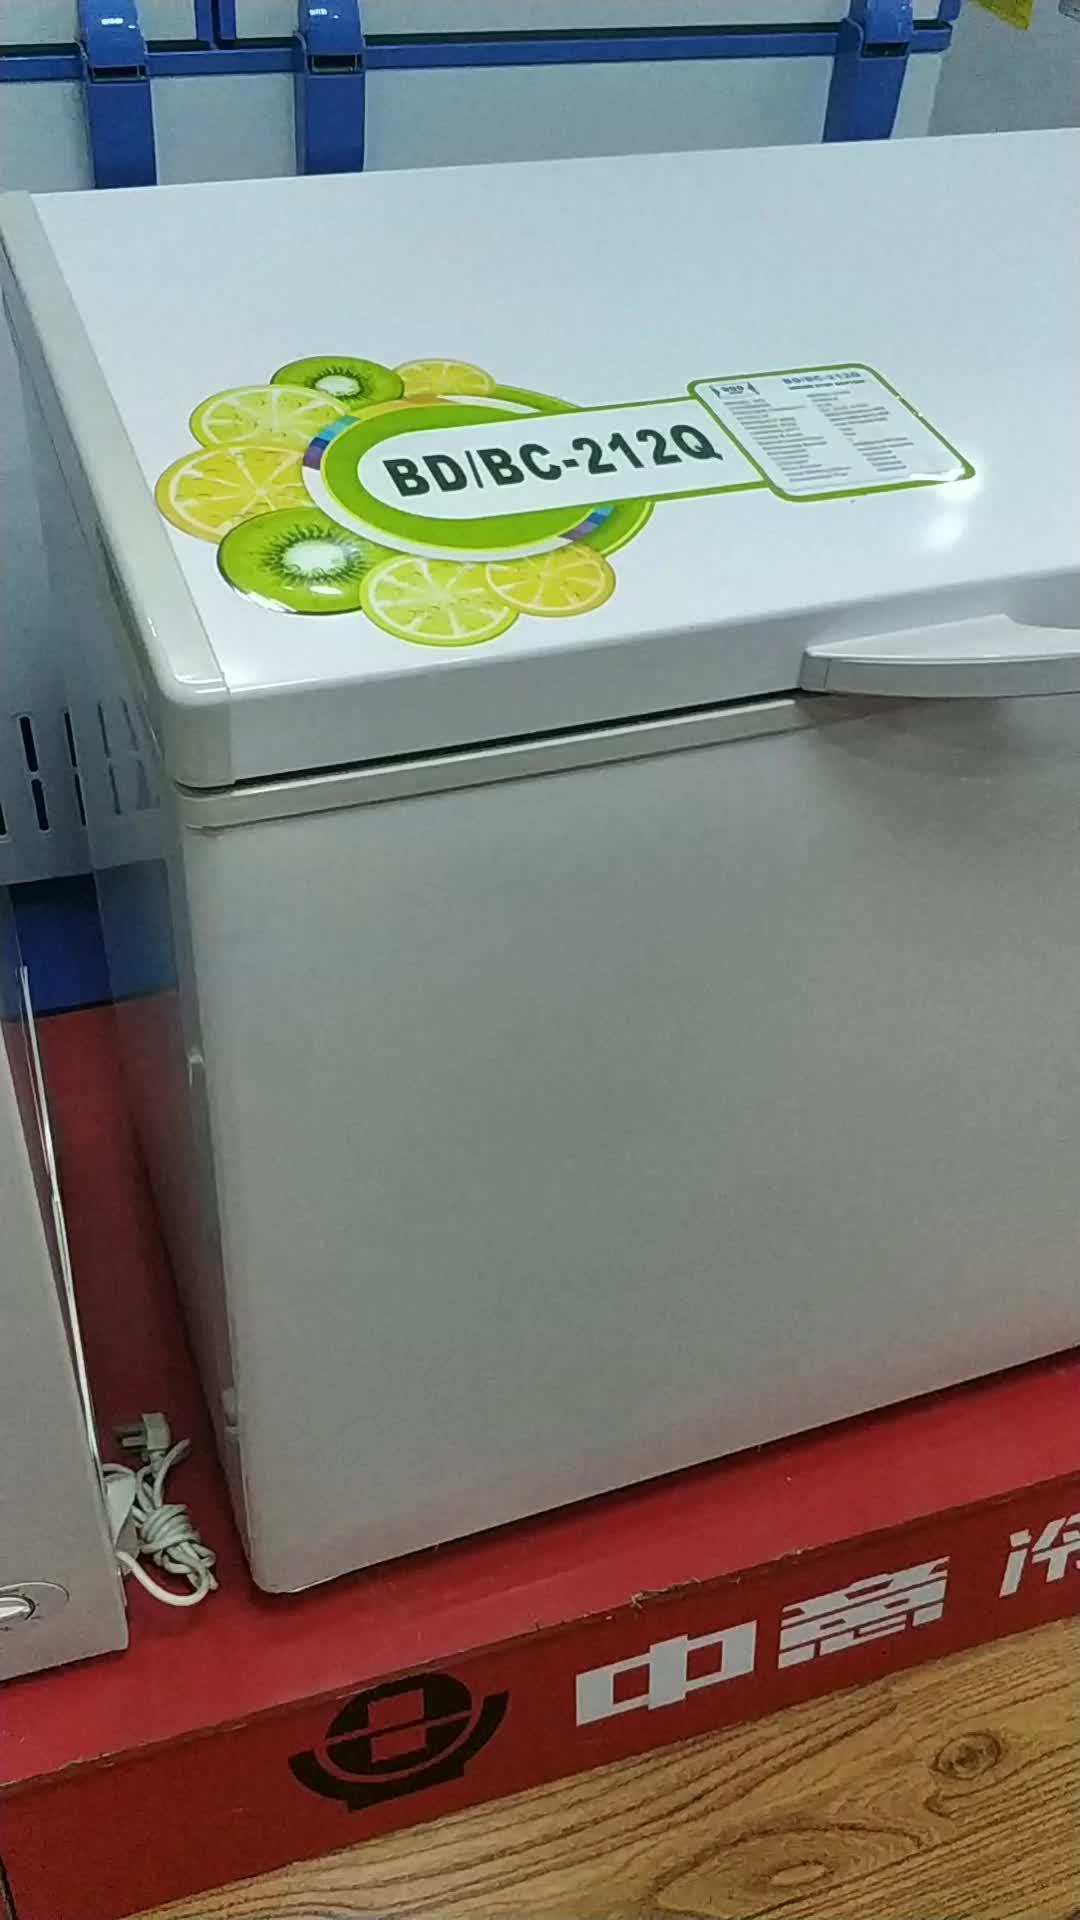 BERING BD/BC-212DC DC 12V Chest Freezer